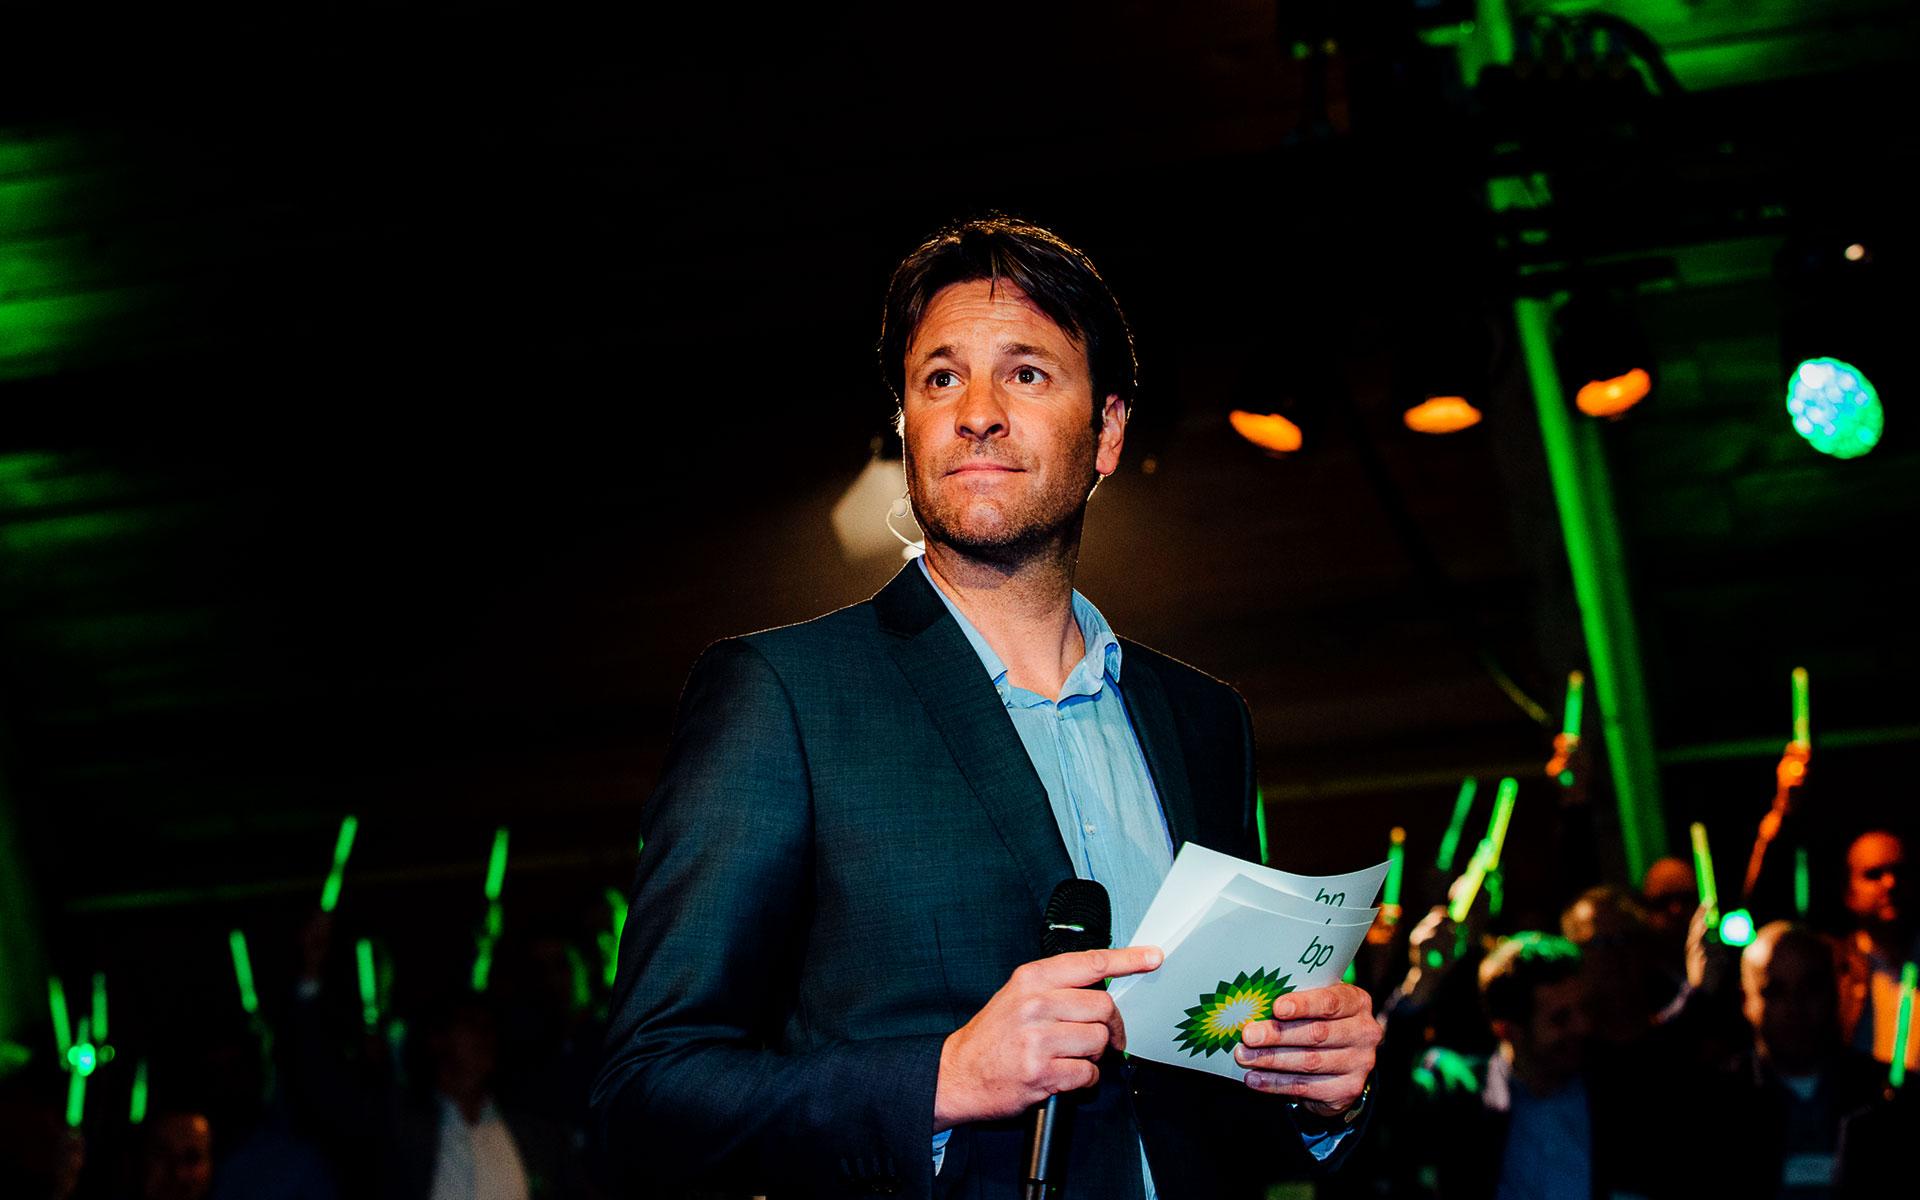 Bp dealevent host Victor Brand